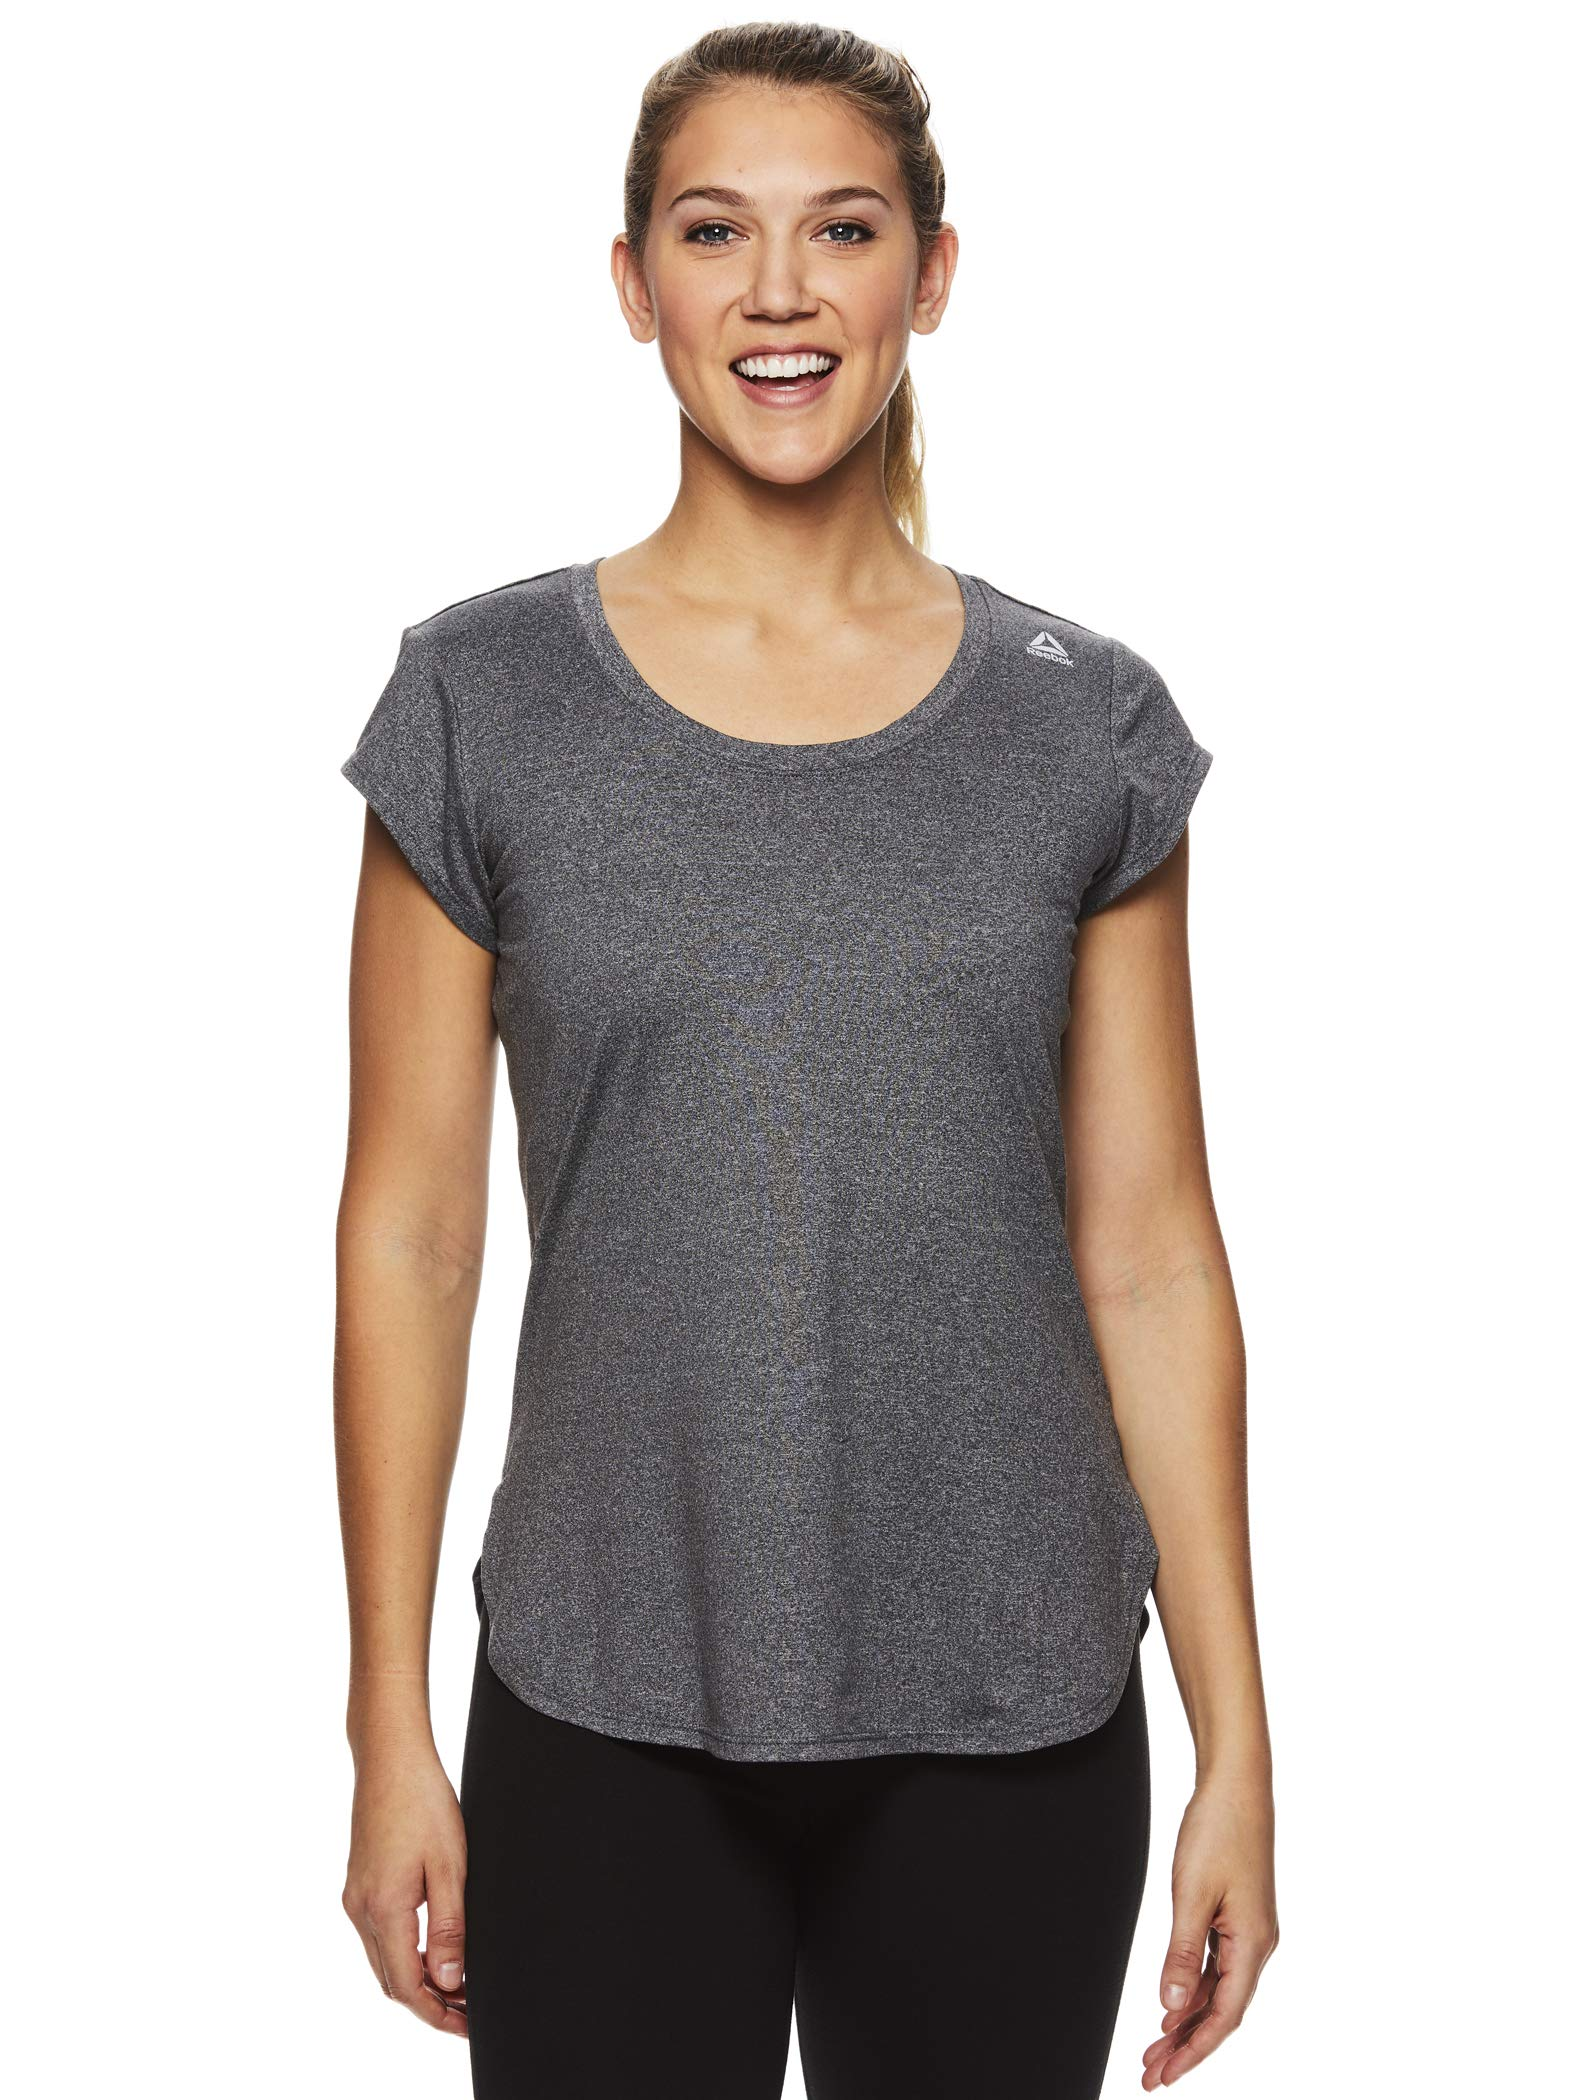 Reebok Women's Legend Performance Short Sleeve T-Shirt with Polyspan Fabric - Charcoal Semi Heather, X-Small by Reebok (Image #4)